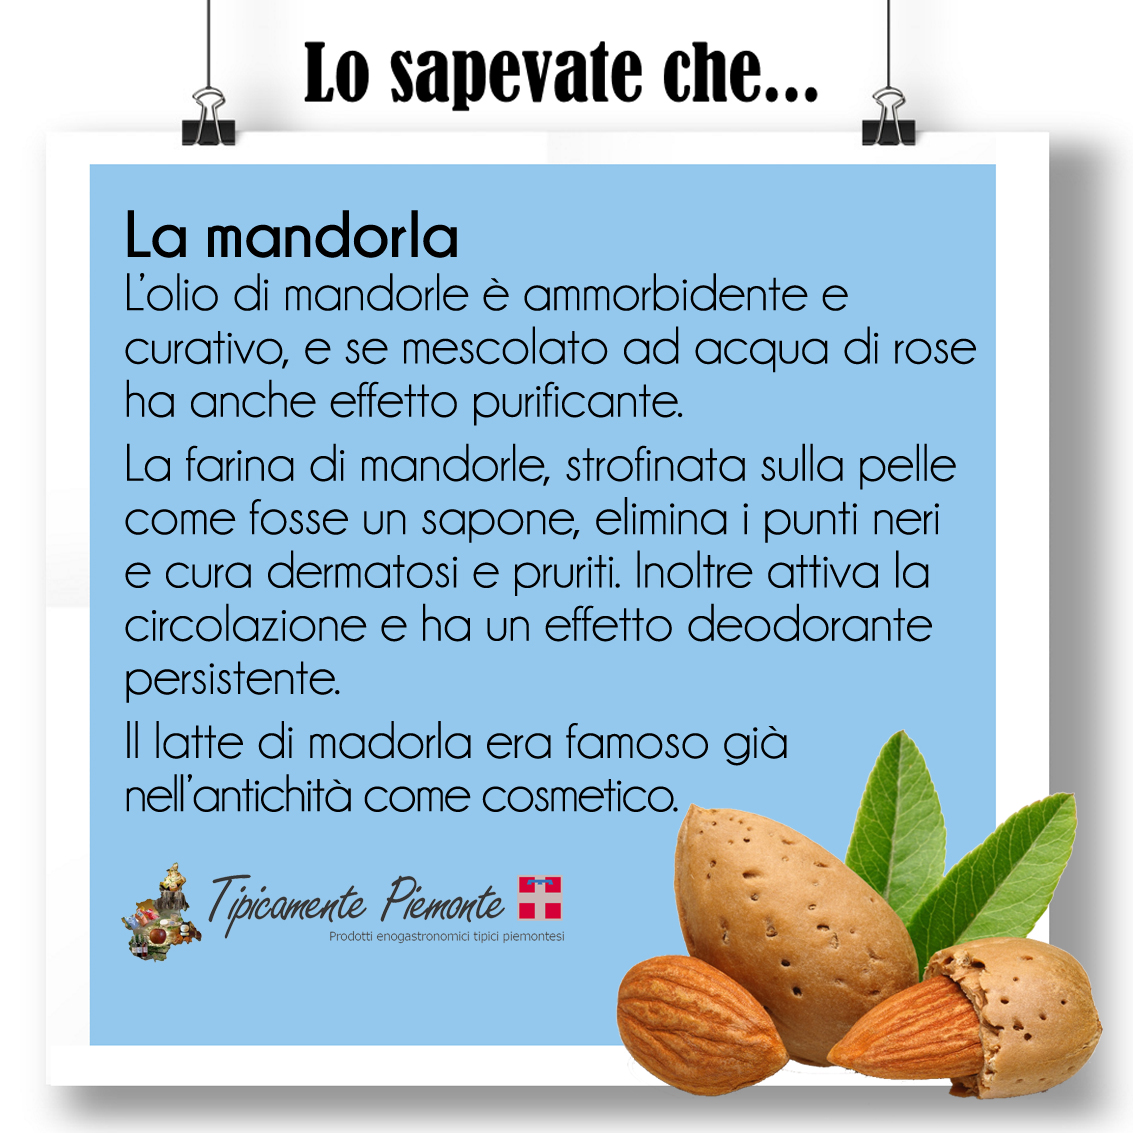 losapevateche_lamandorla